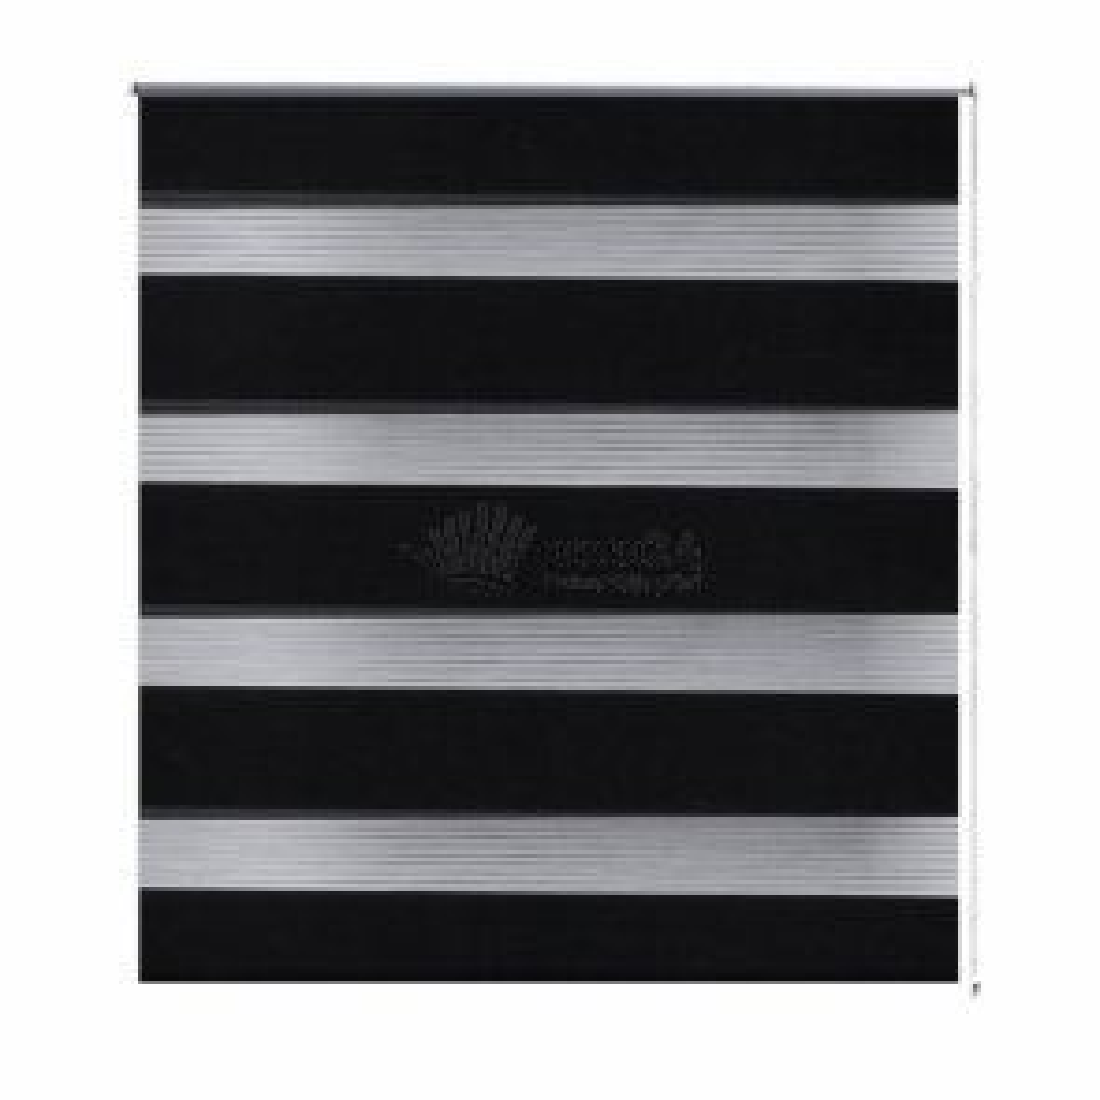 Roleta Zebra / noc a den / Twinroll 120 x 175 cm, černá